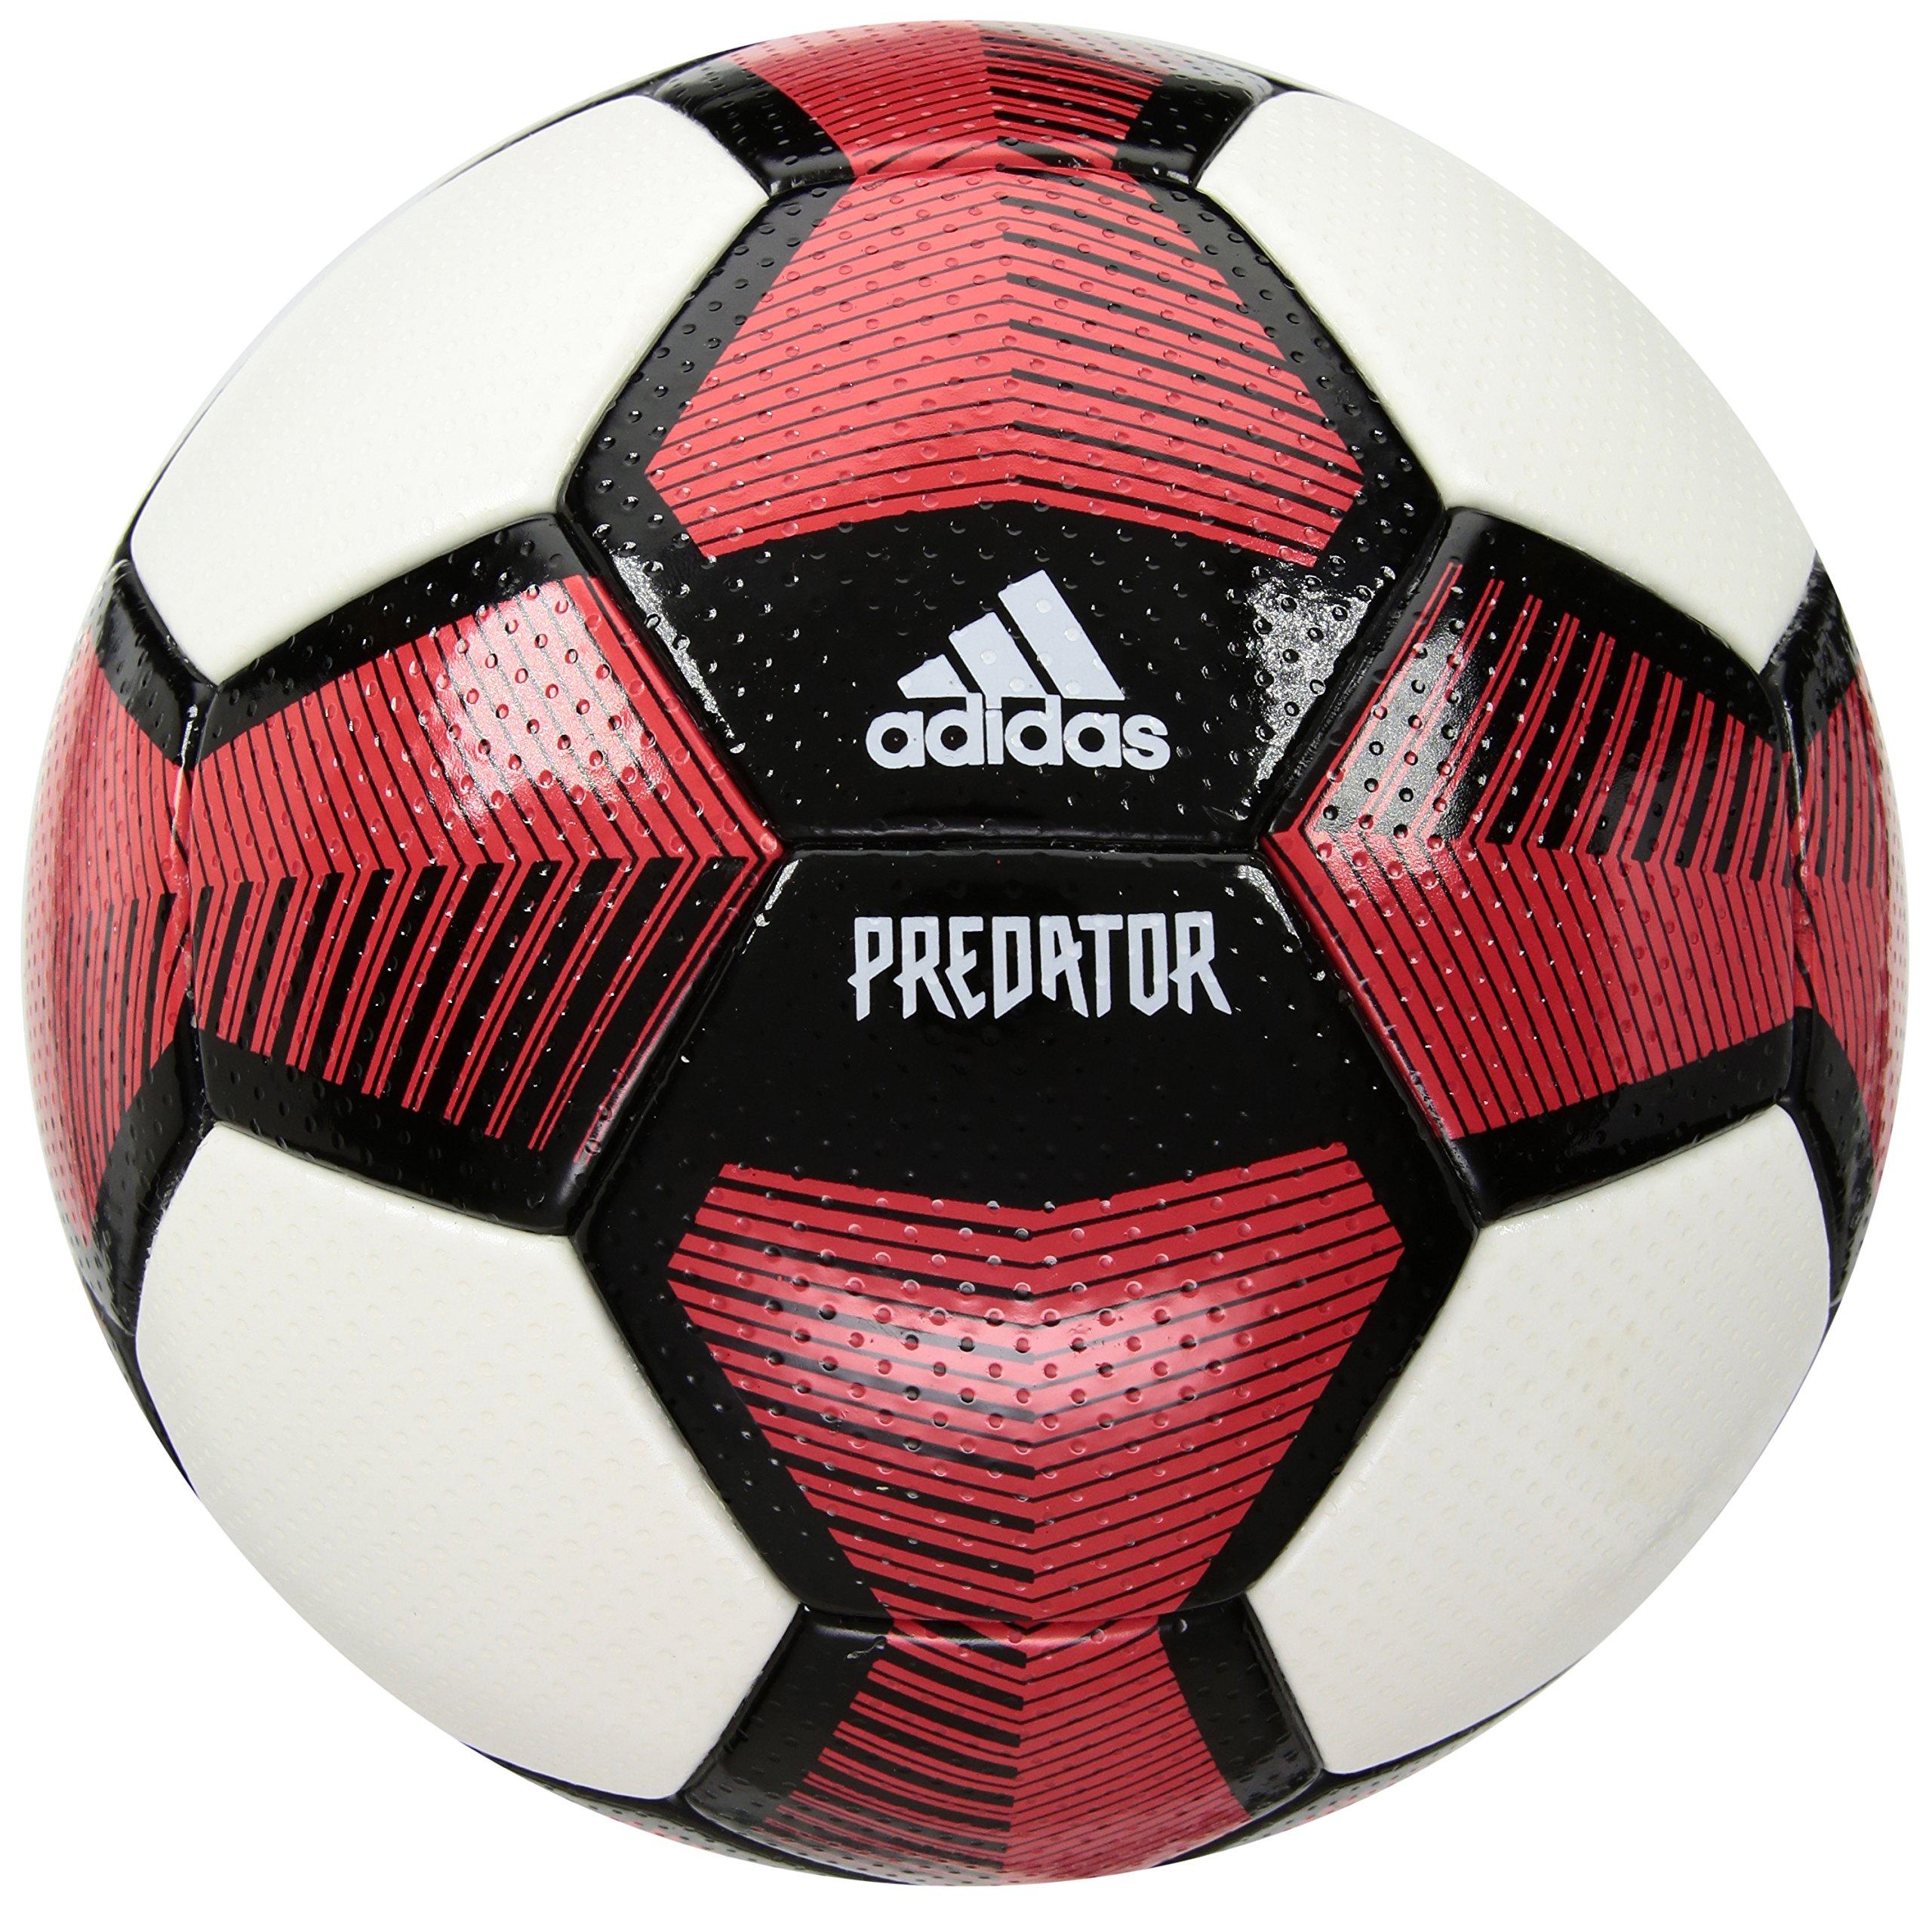 Suburbio Robar a ingresos  adidas Predator Competition Ball - Soccer- Buy Online in Burkina Faso at  burkinafaso.desertcart.com. ProductId : 67110096.